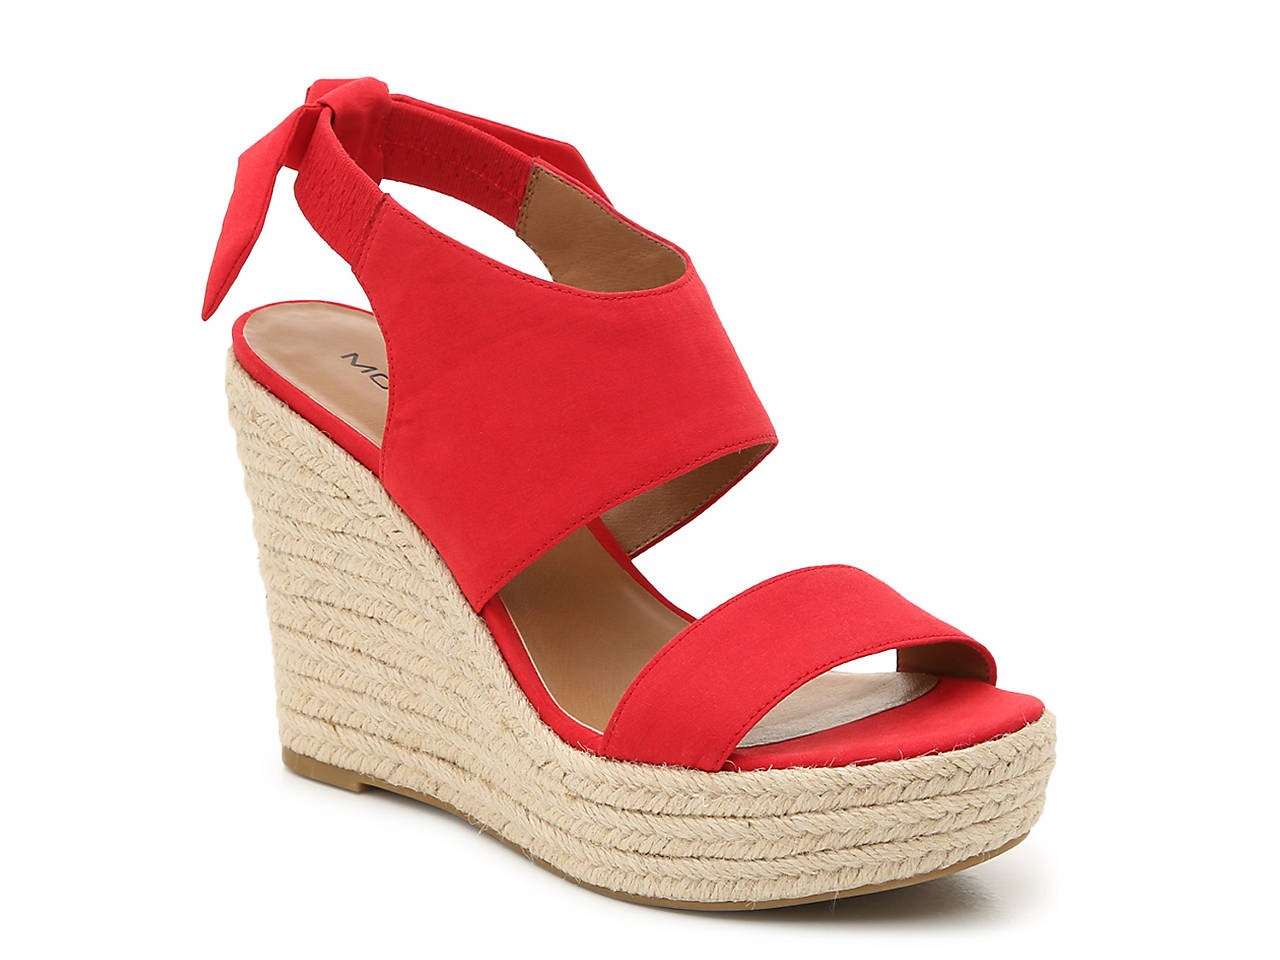 02e791145f78 Moda Spana Unes Espadrille Wedge Sandal Women s Shoes